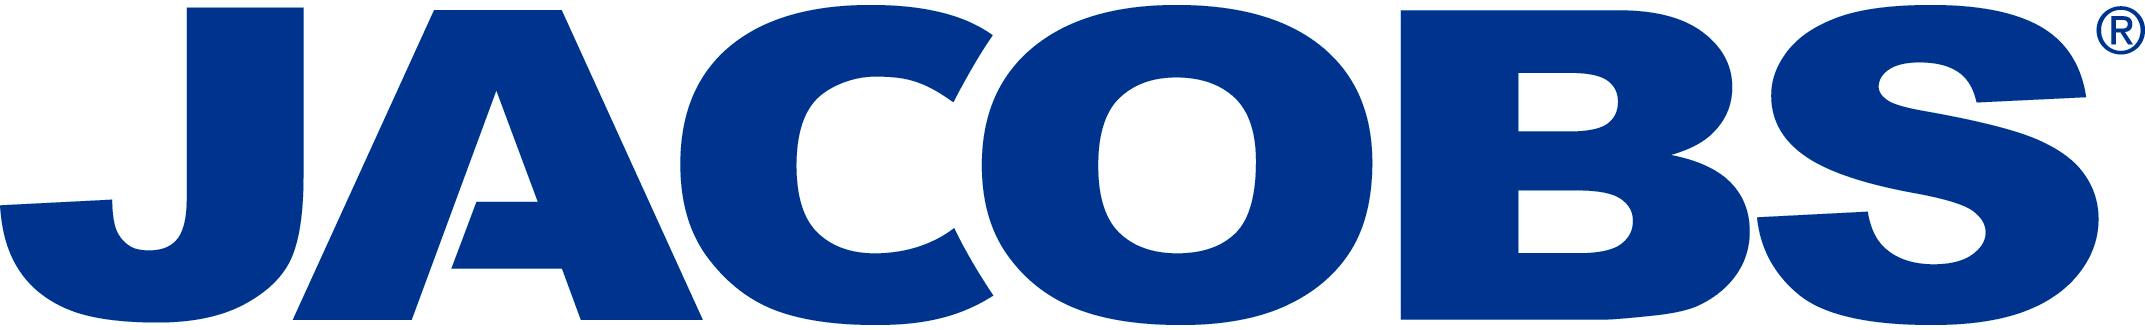 Jacobs Logo_Blue.jpg